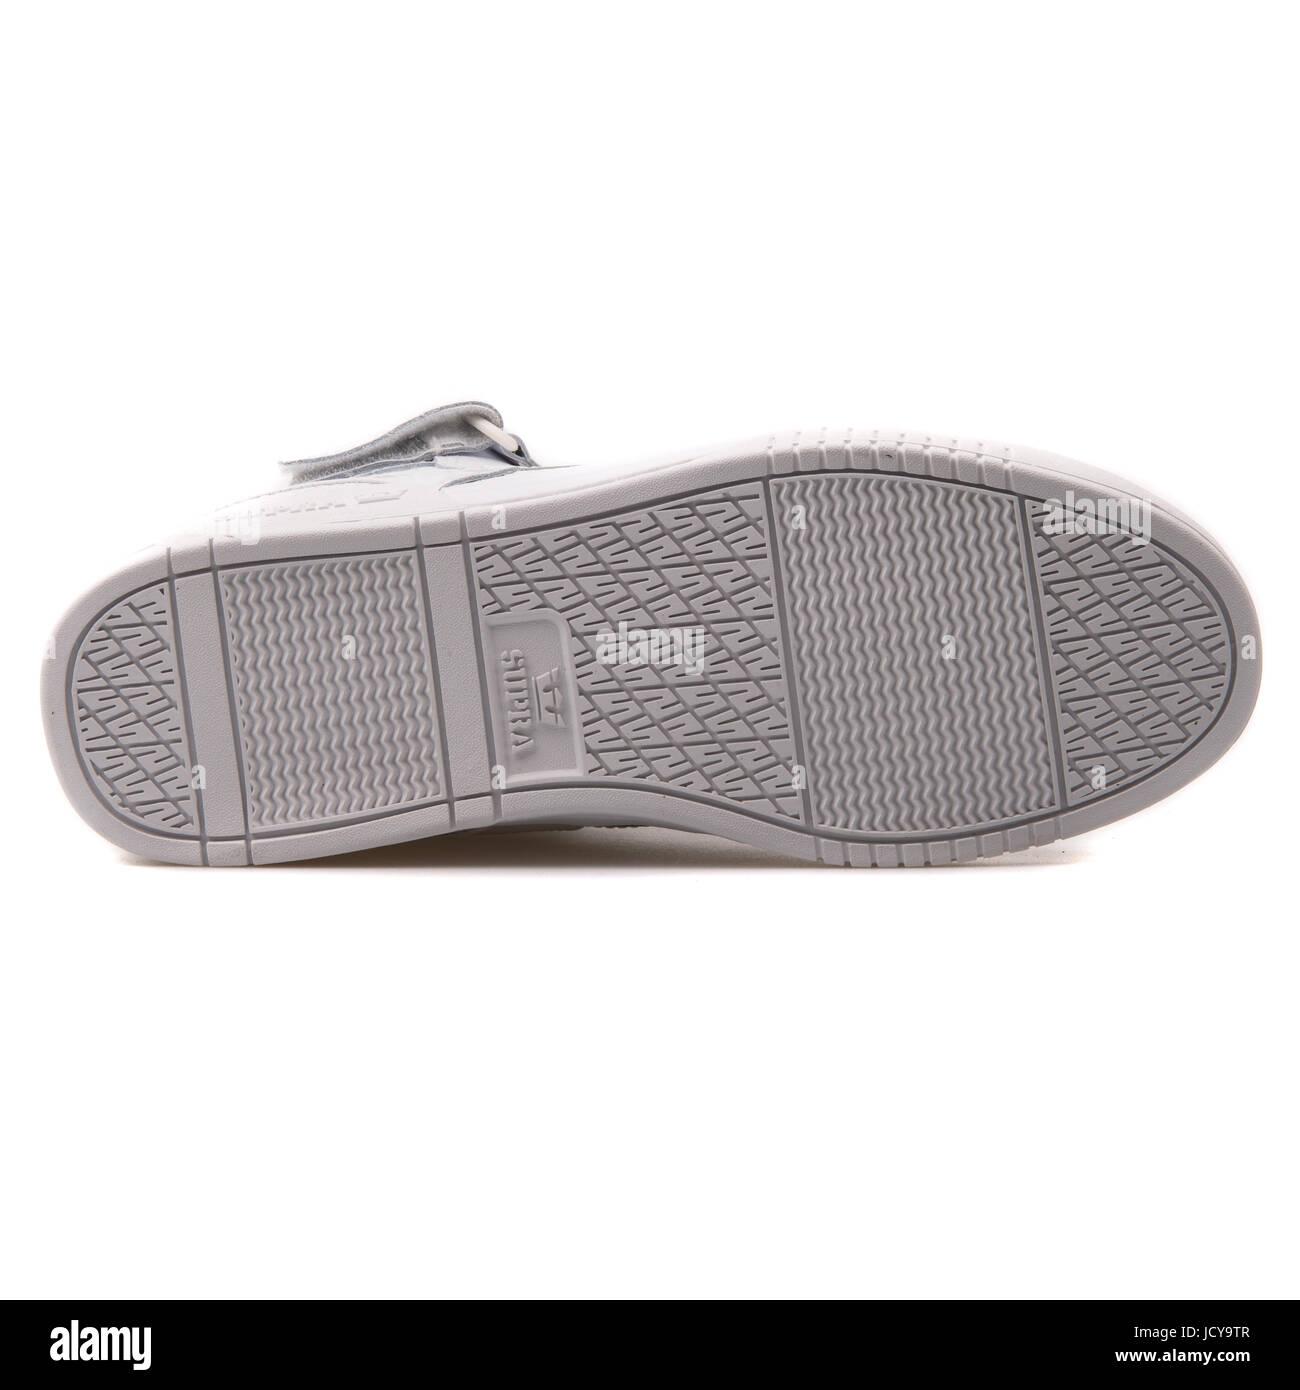 c2c3ec59f906 Supra Bleeker White Men s Sportive Shoes - S02103 Stock Photo ...